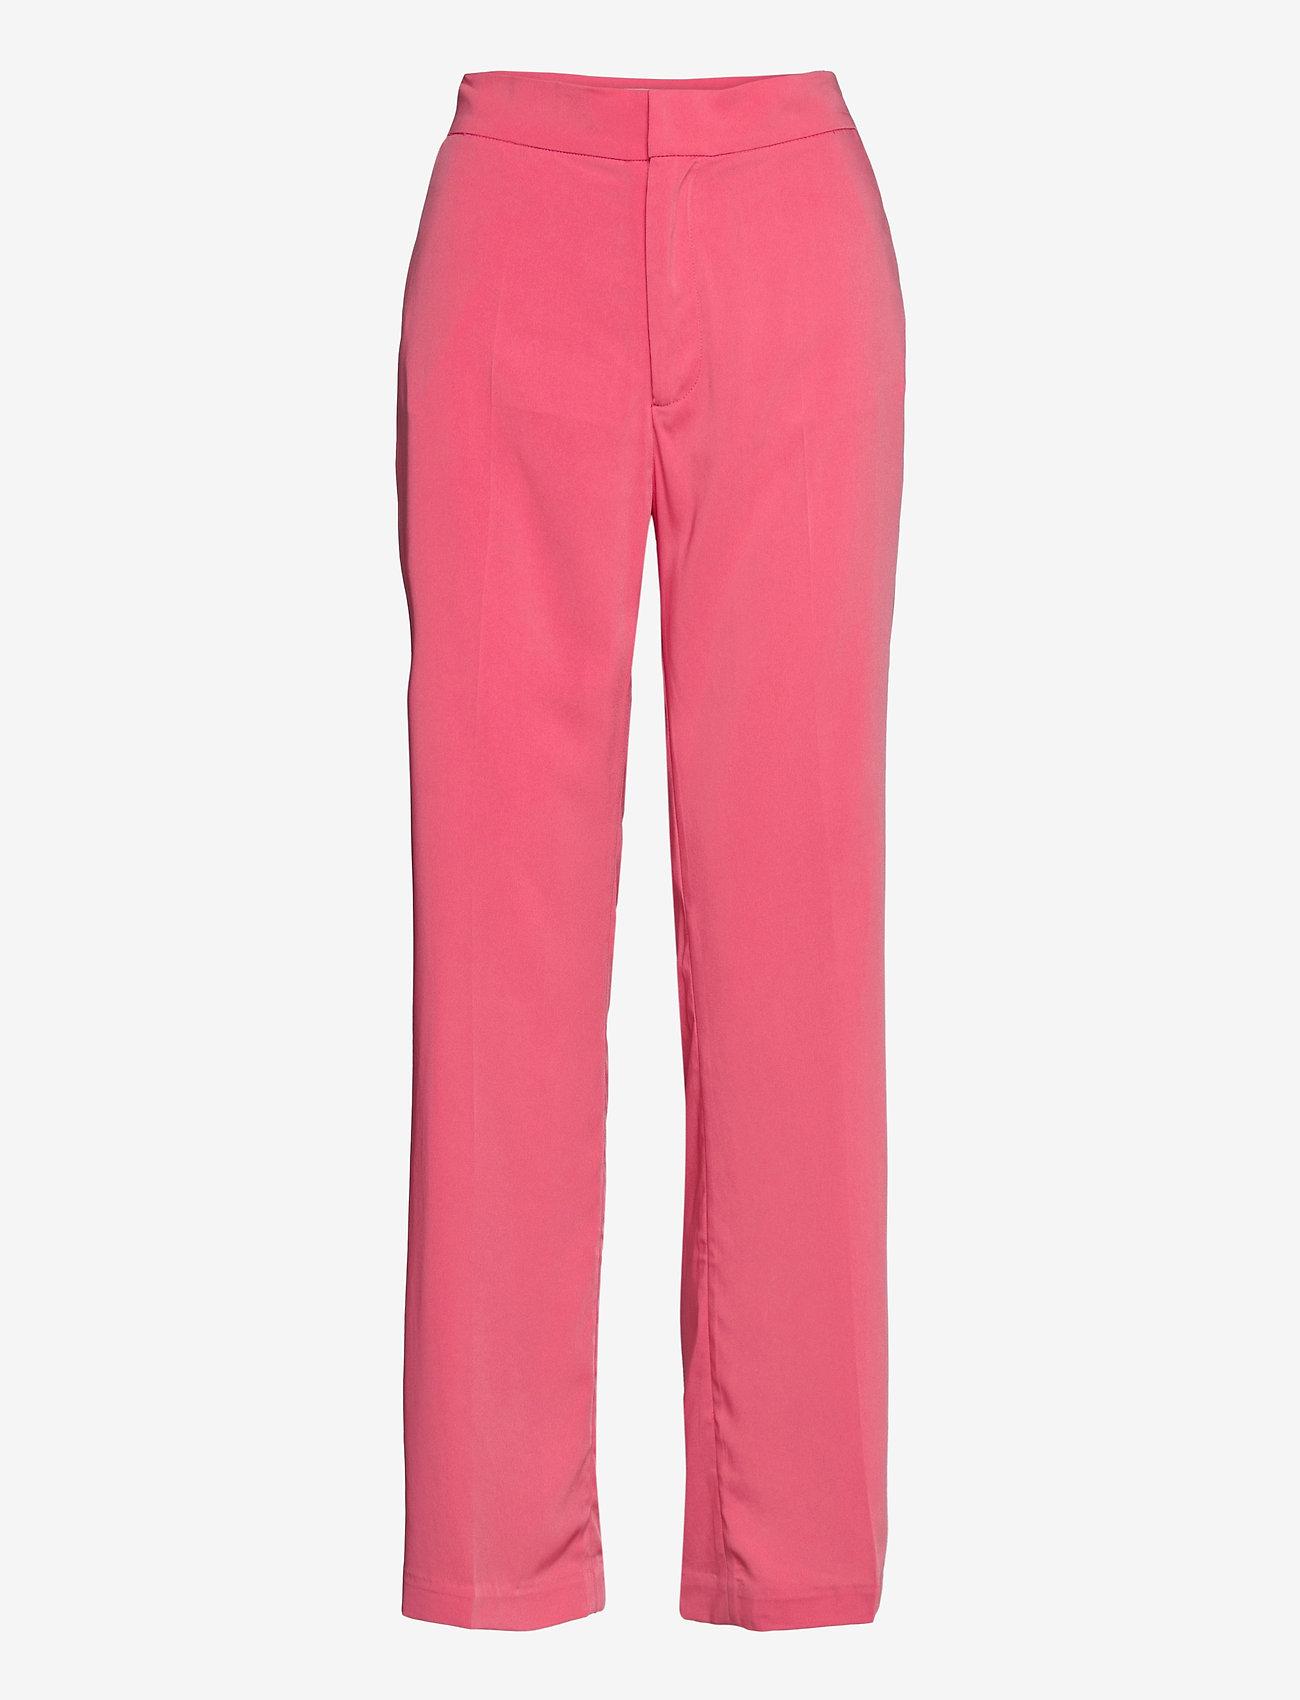 By Malina - Rosetta pants - byxor - ballet pink - 1